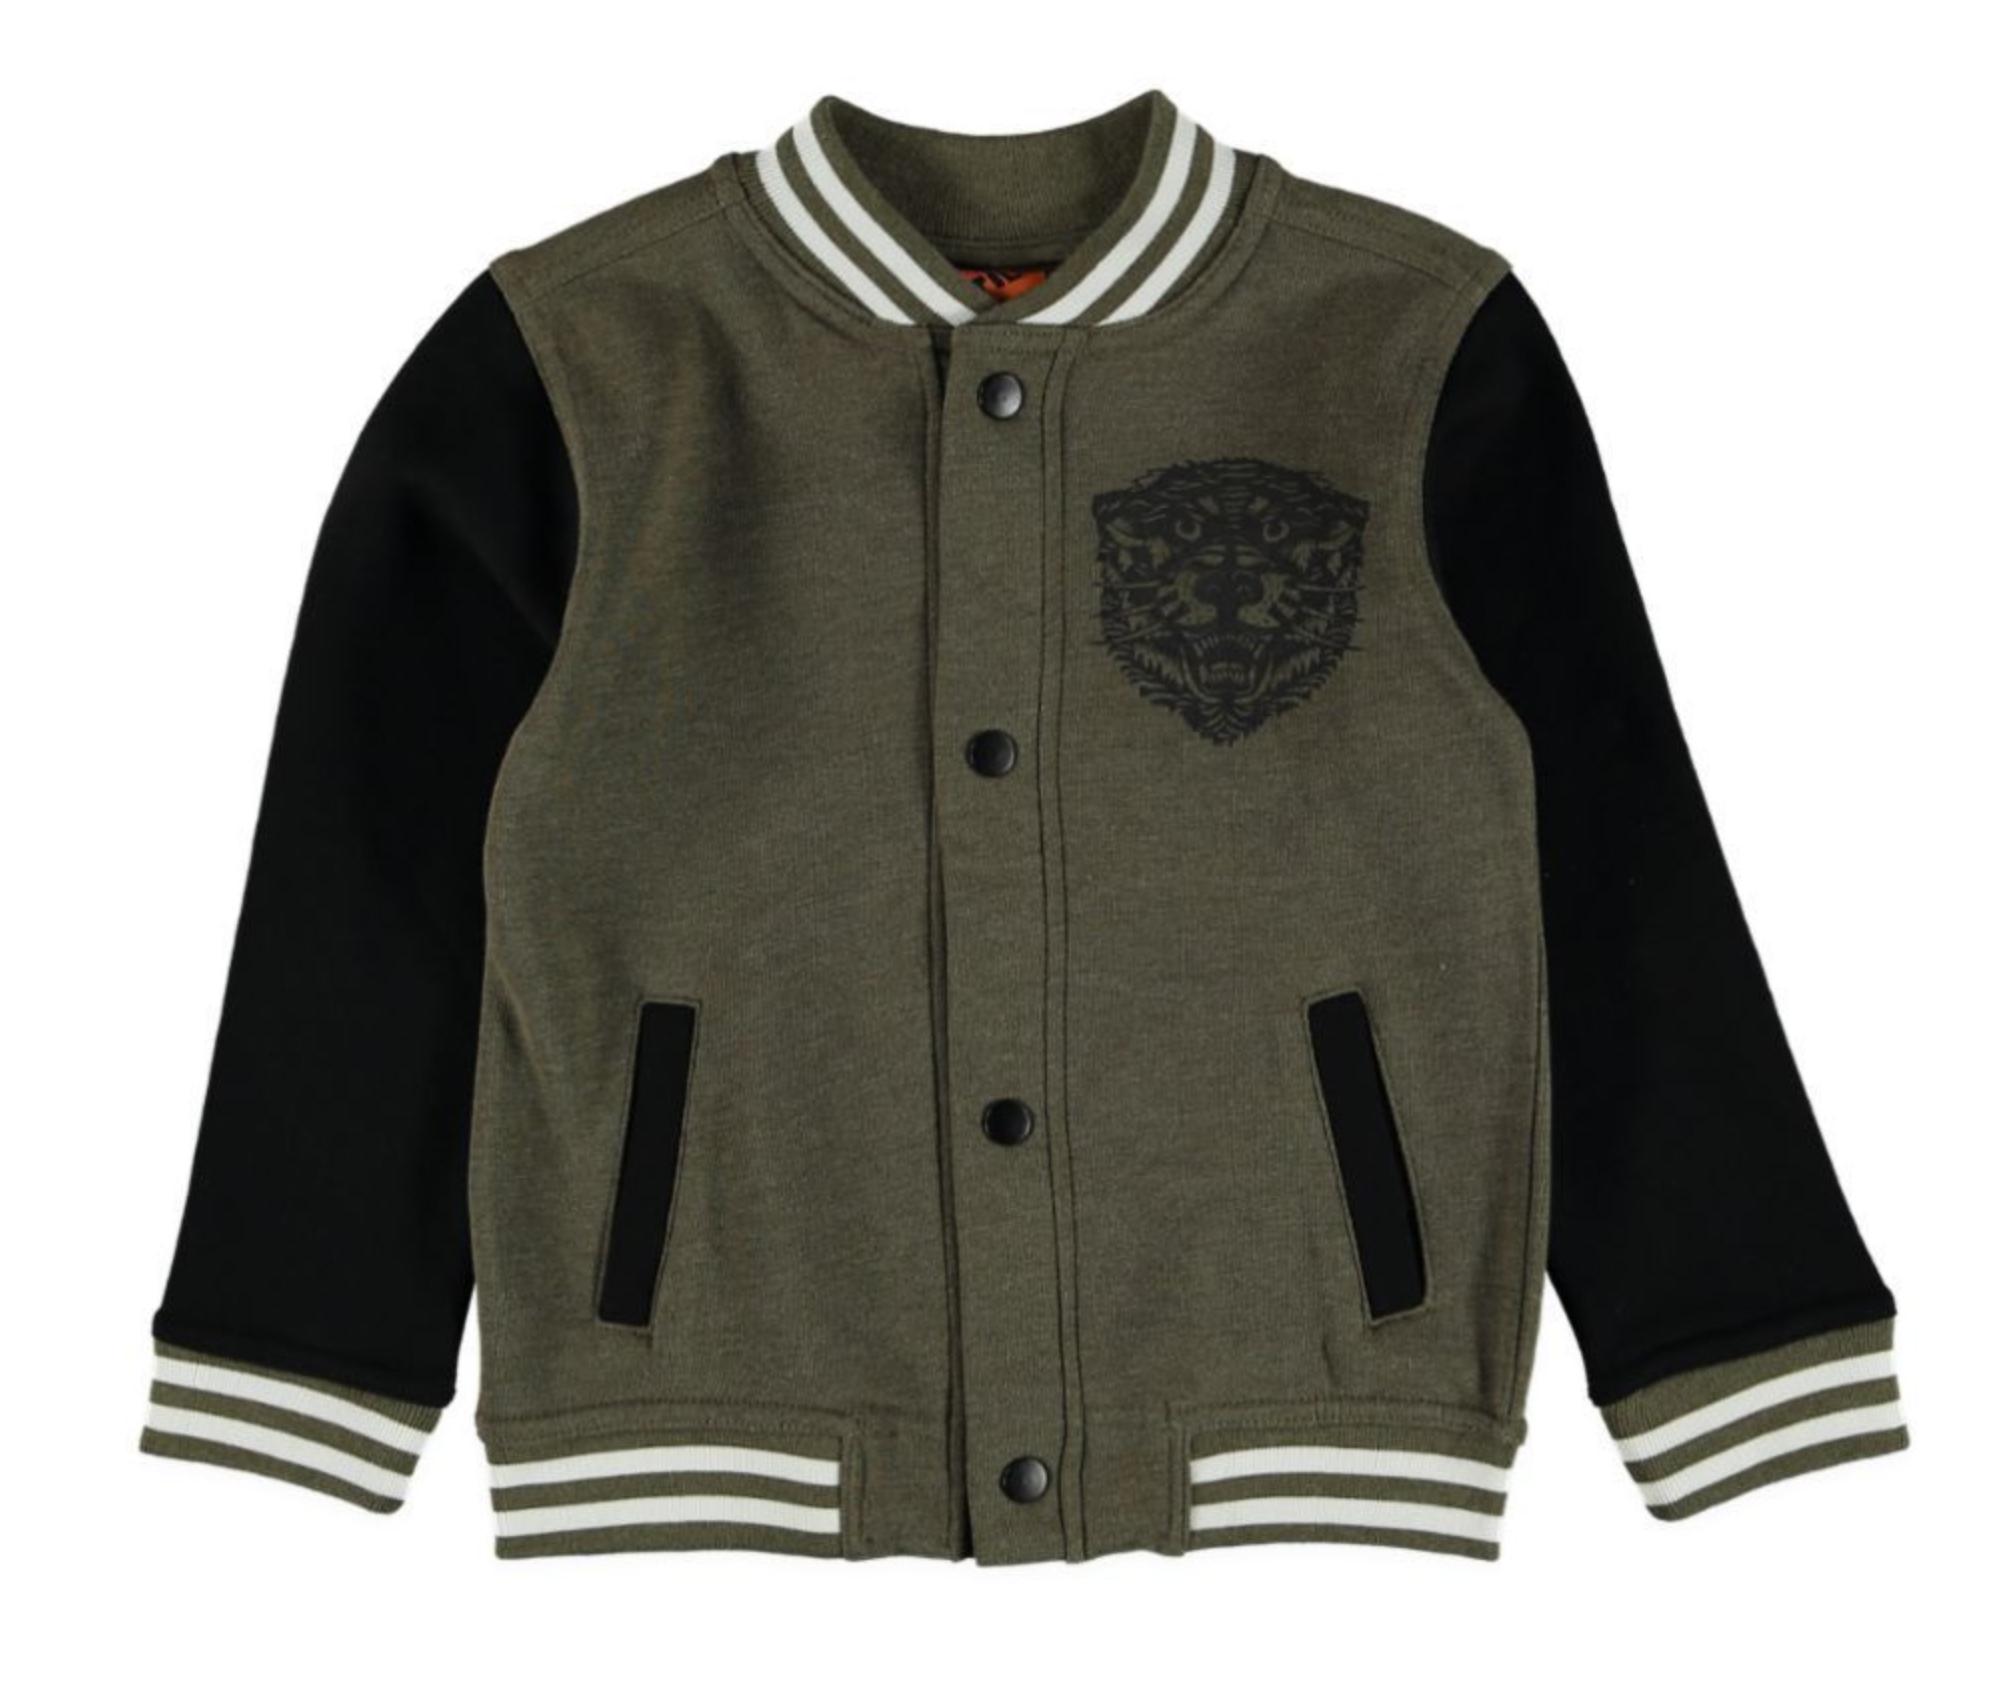 Toddler Boy College Jacket $15.00